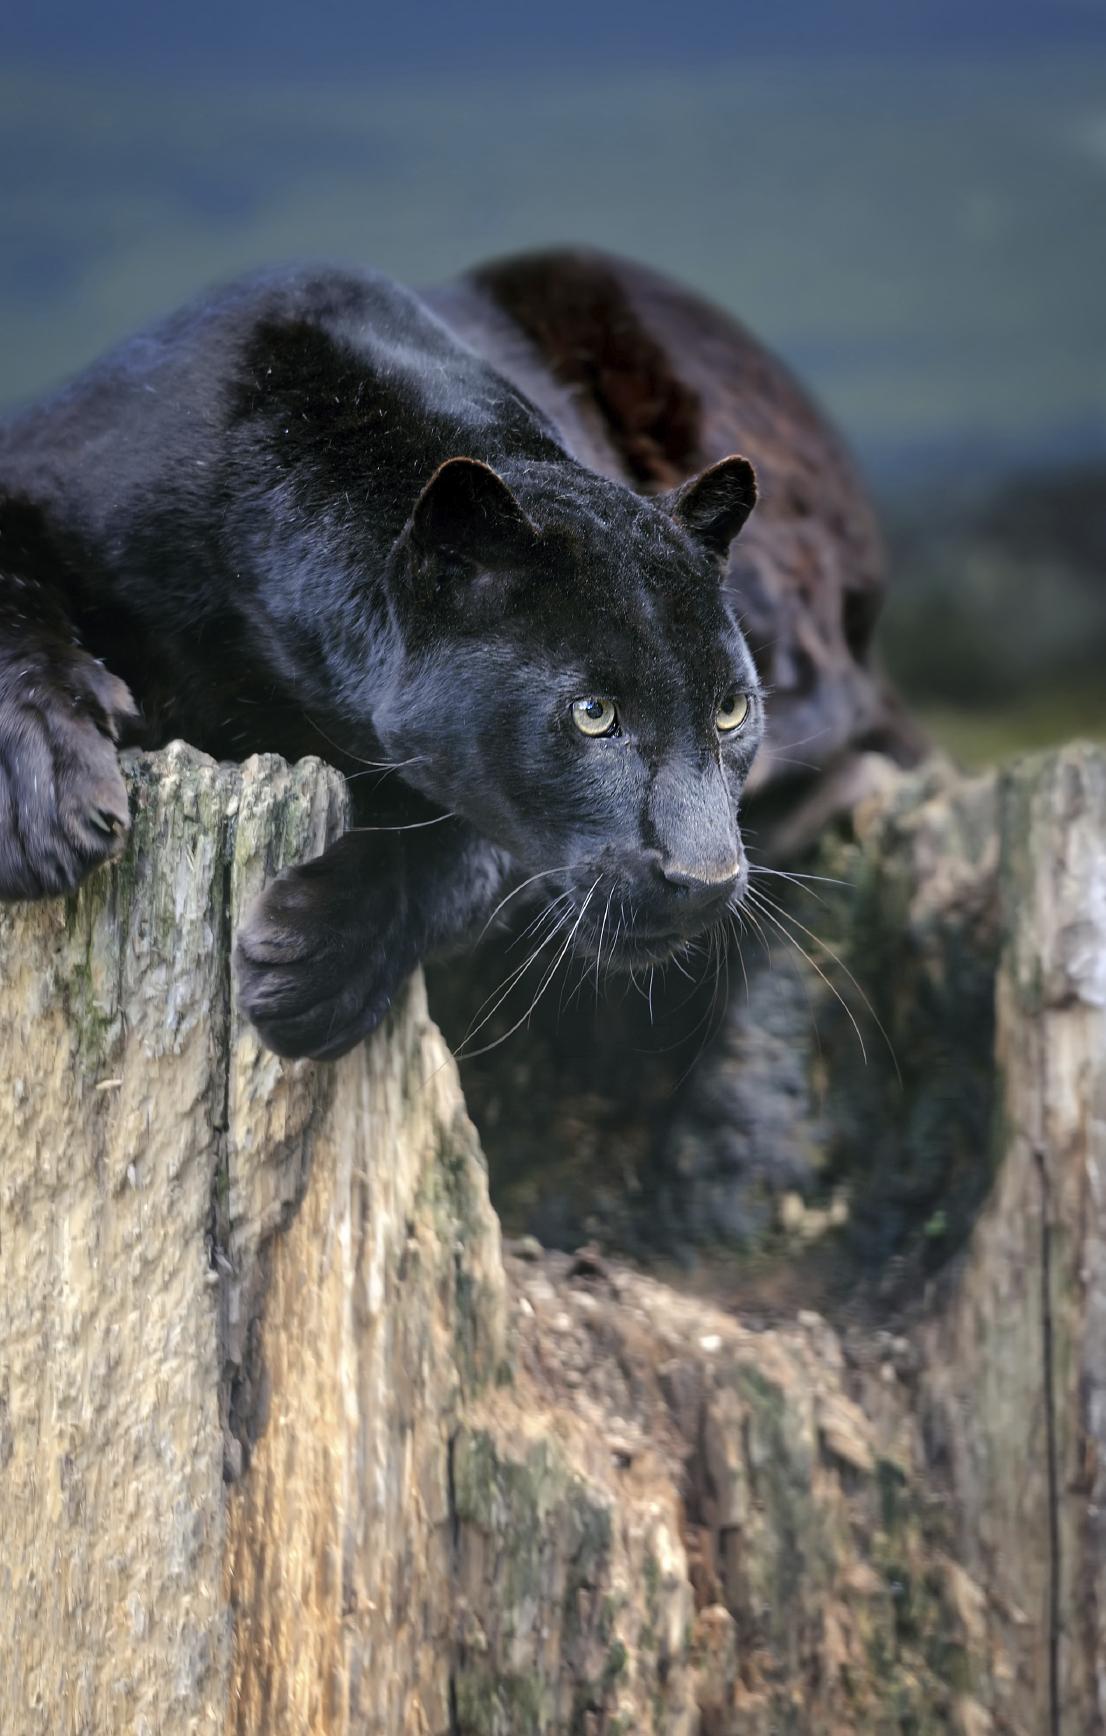 Saving Their Skin: Malay Peninsula's Rare Black Leopards ... - photo#11